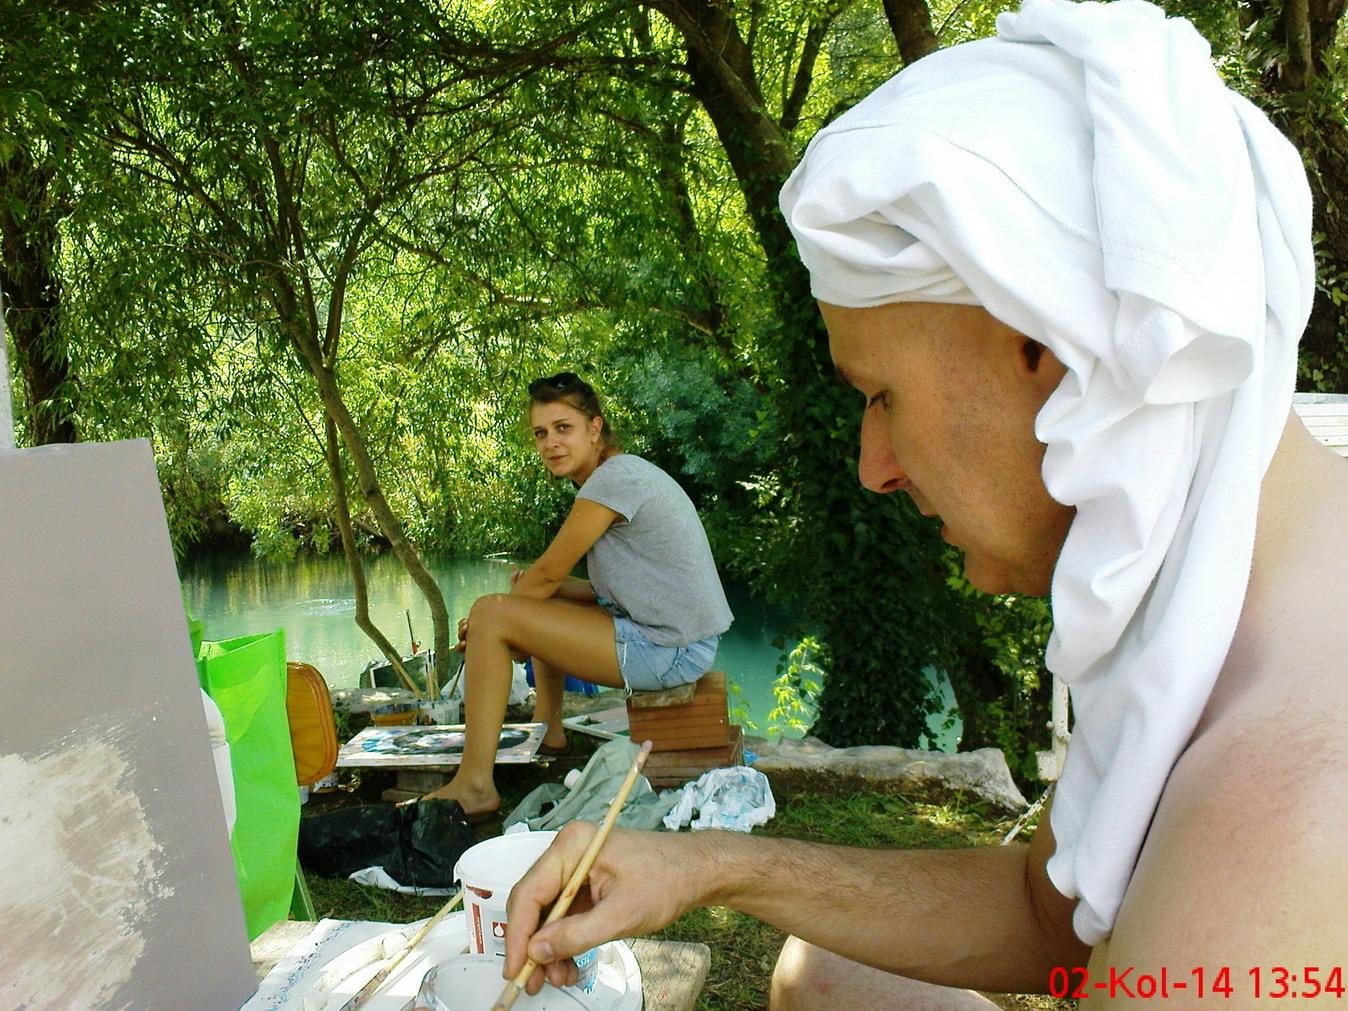 dario pehar i tamara grbavac